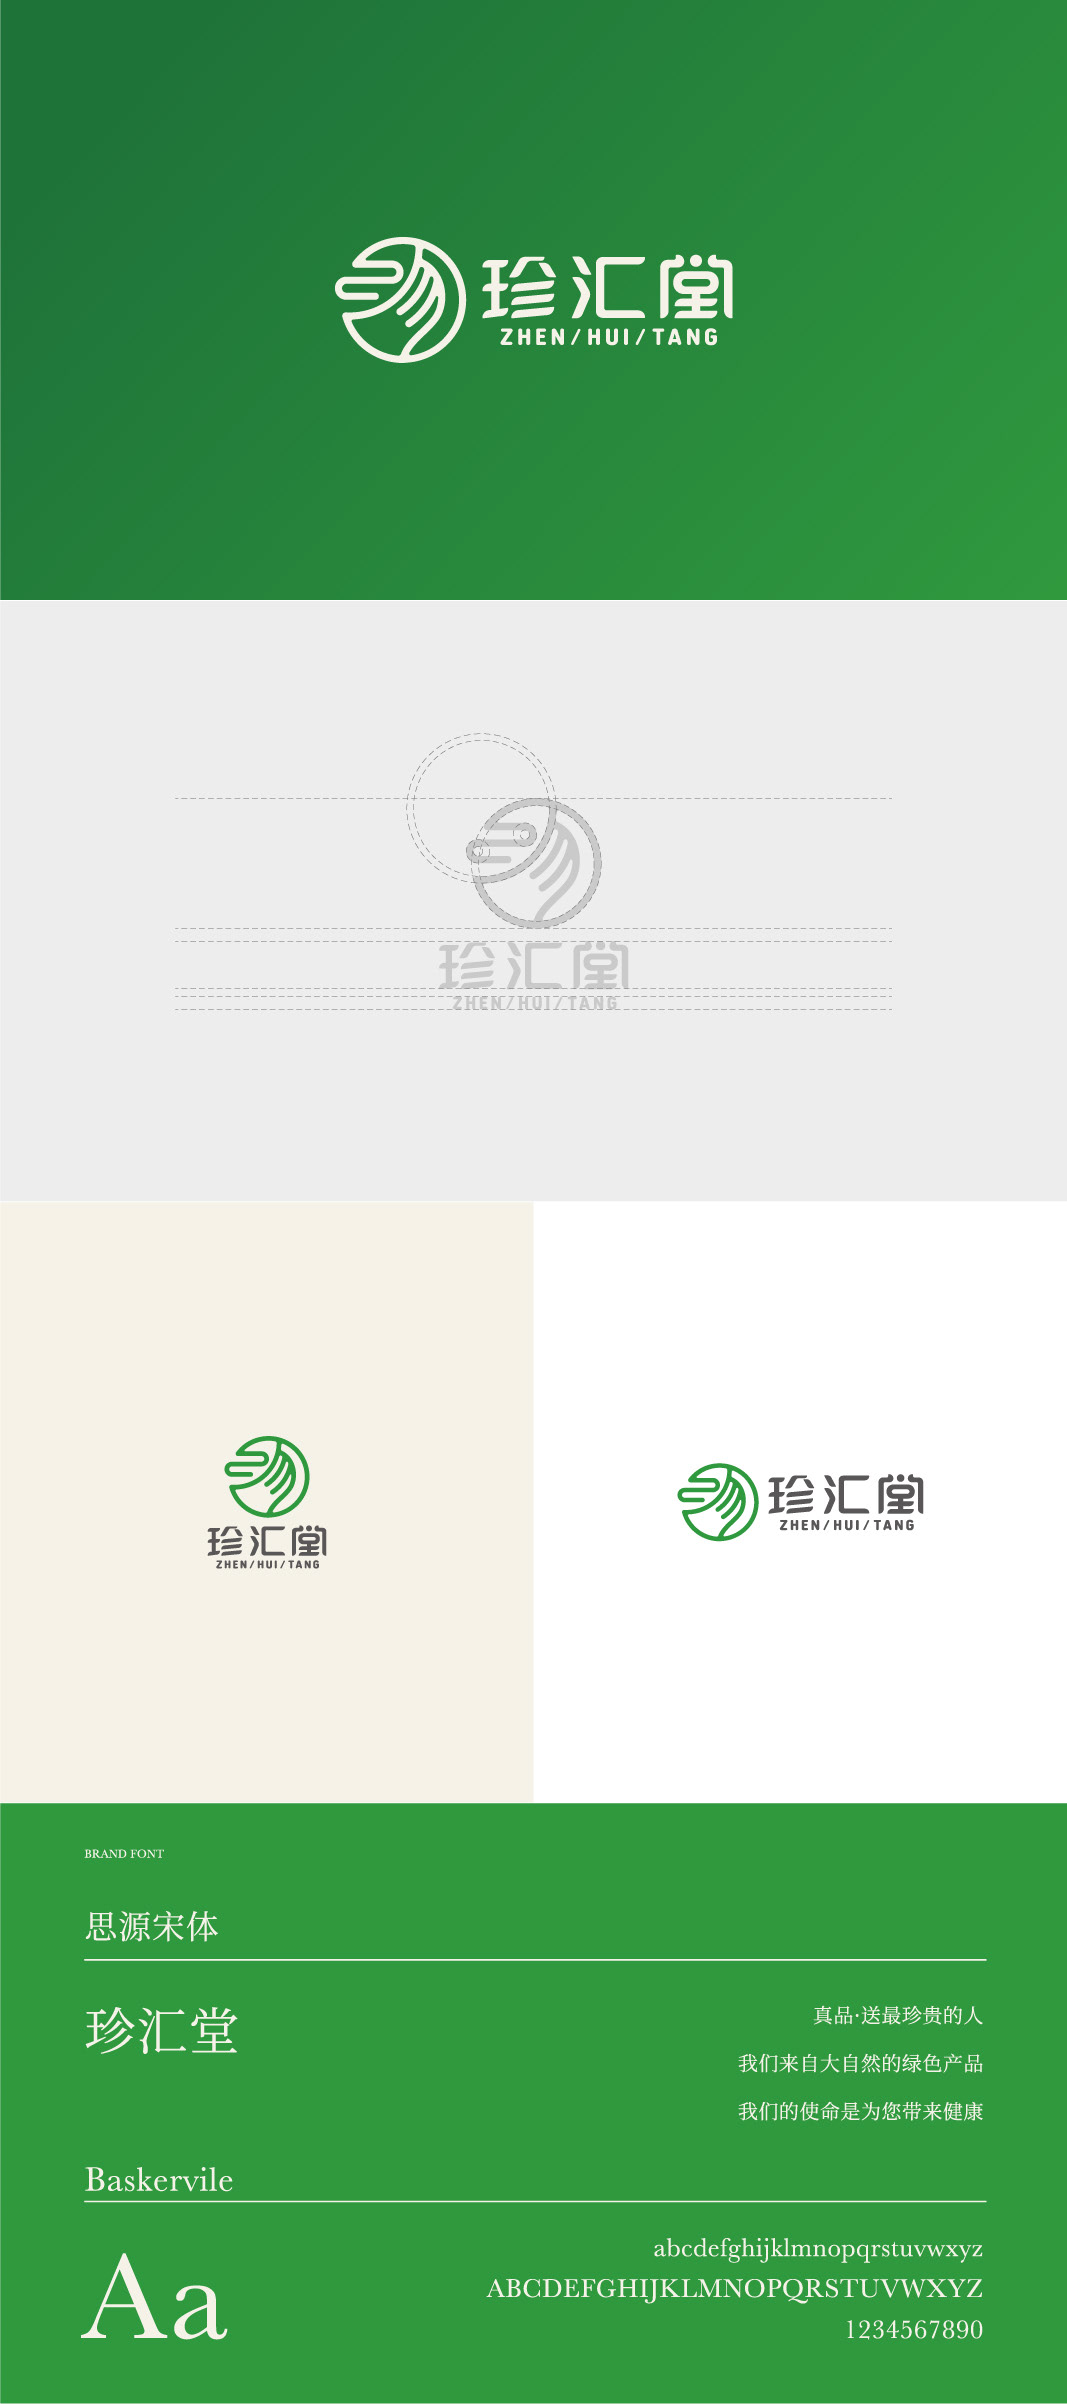 brand design inchtime logo VI 一寸光阴 品牌 设计